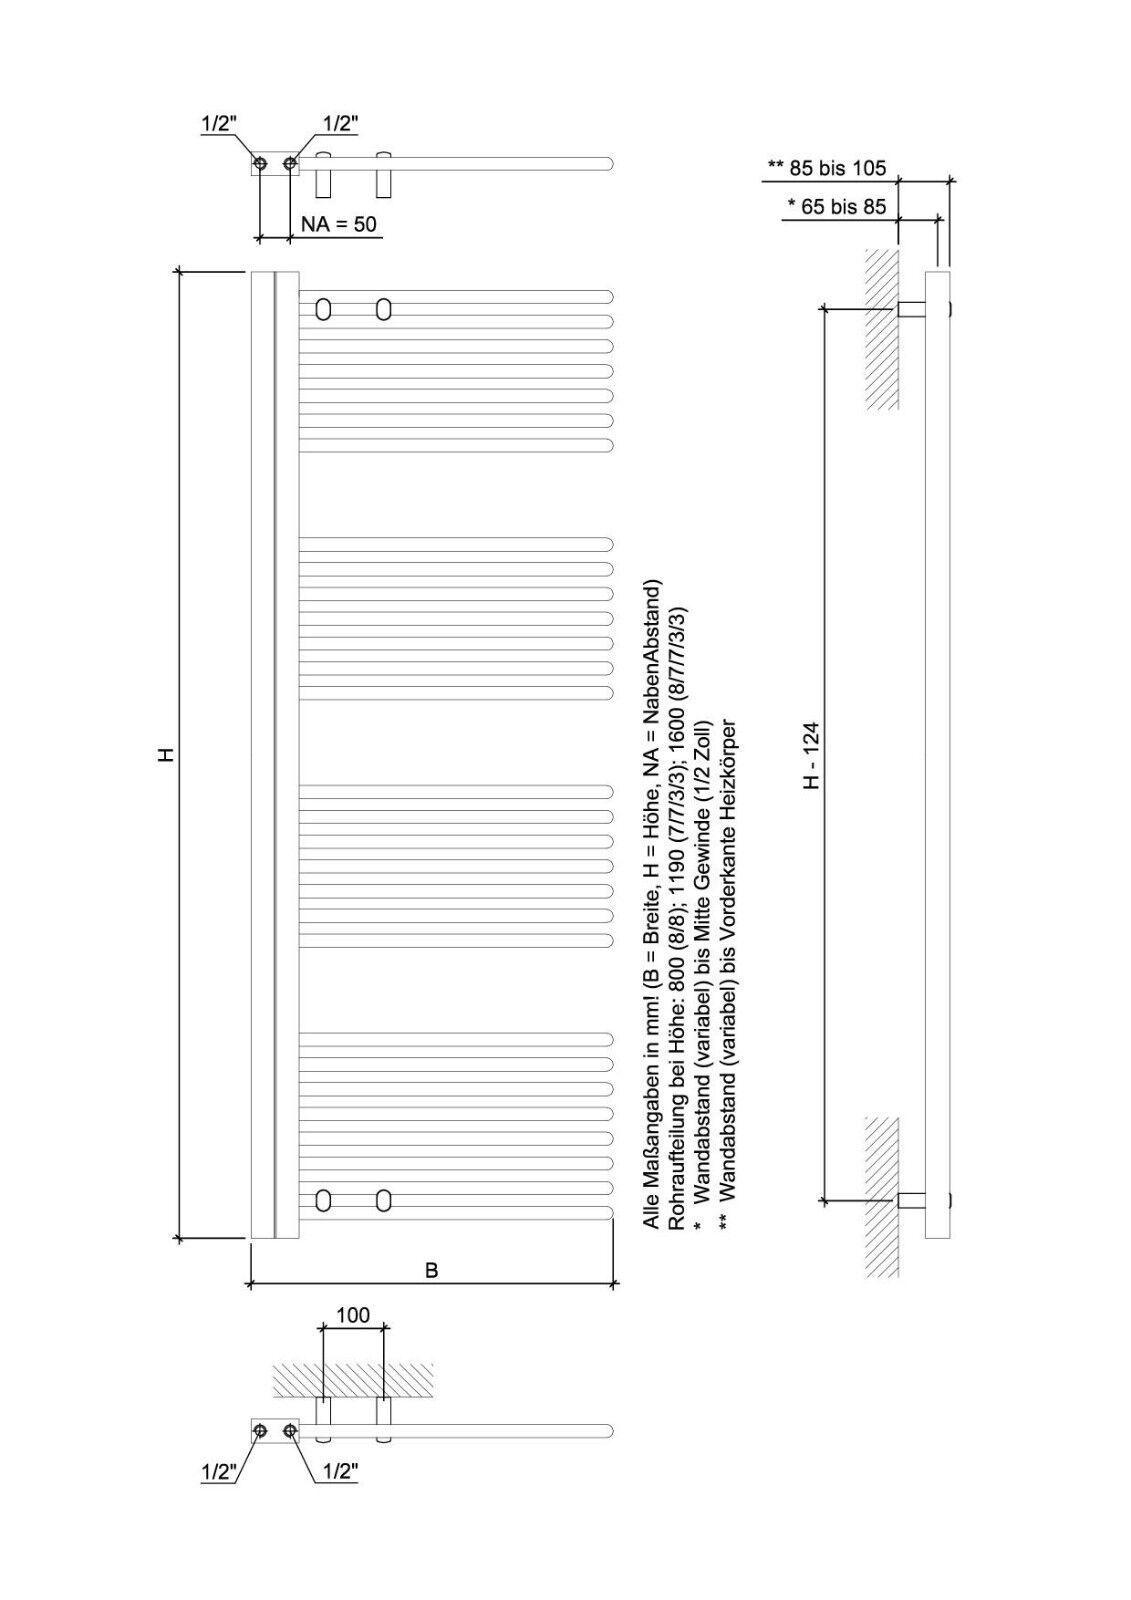 Ximax Design-Heizkörper Bad-Heizkörper Handtuchwärmer C5 119 x 60 x x x 4 cm 605W e9b4d5